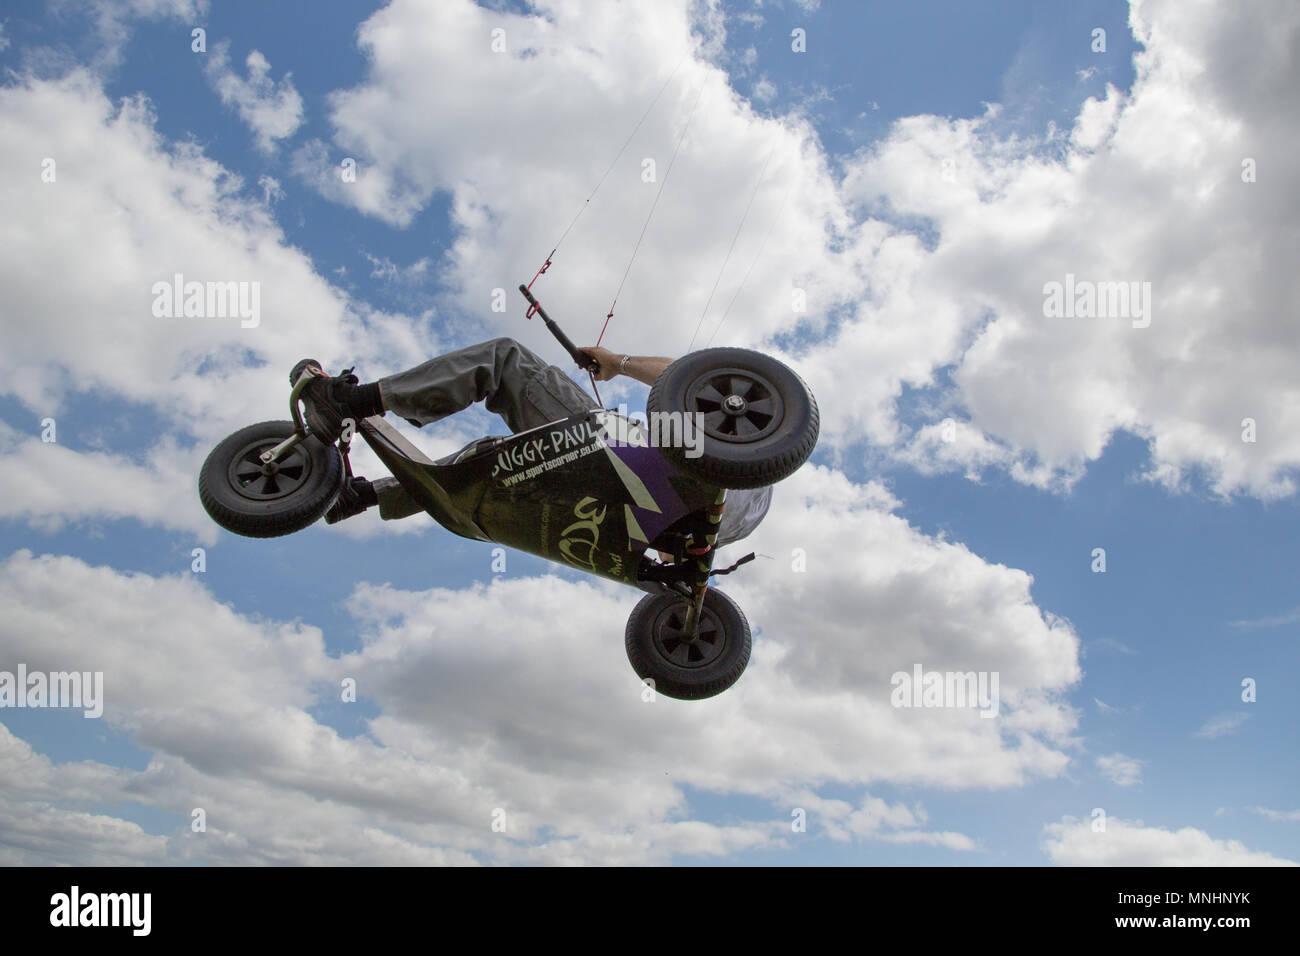 Extreme sport kite landboarding in Essex, UK. Airborne in a land buggy. - Stock Image